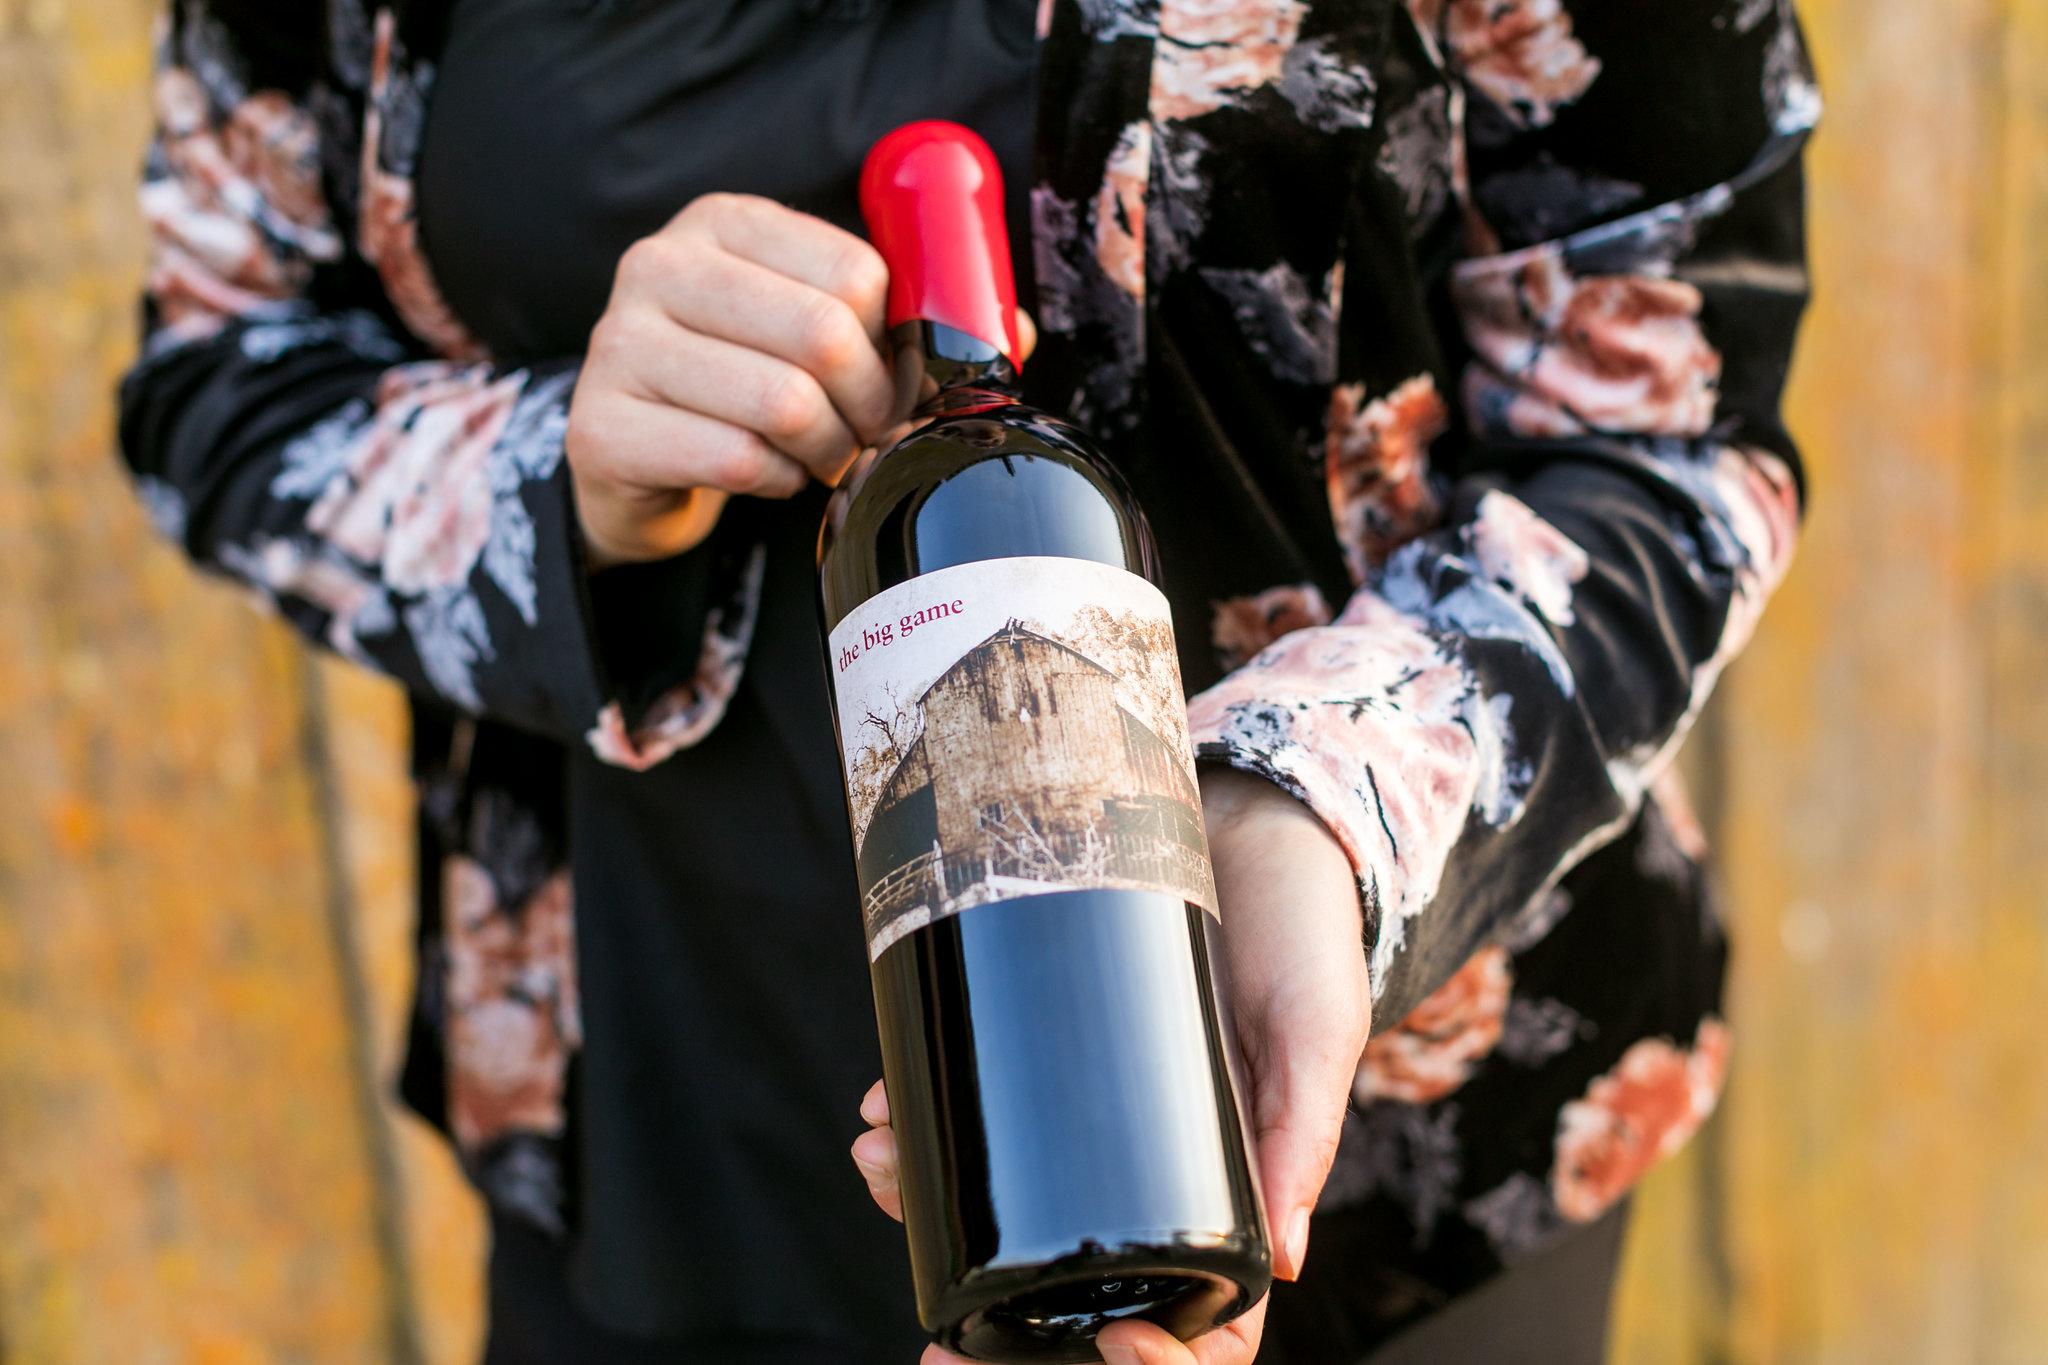 cameron_ingalls-the_farm_winery-madsen-0709.jpg